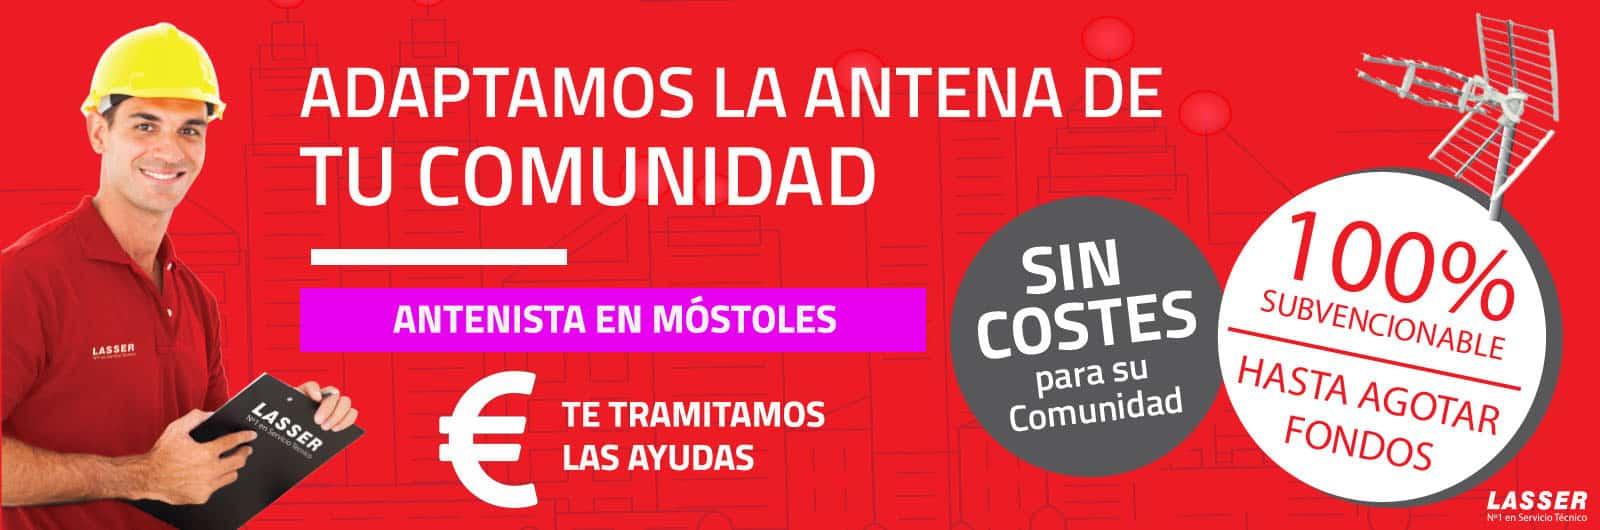 segundo-dividendo-digital-antena-comunidades-promocion-mostoles